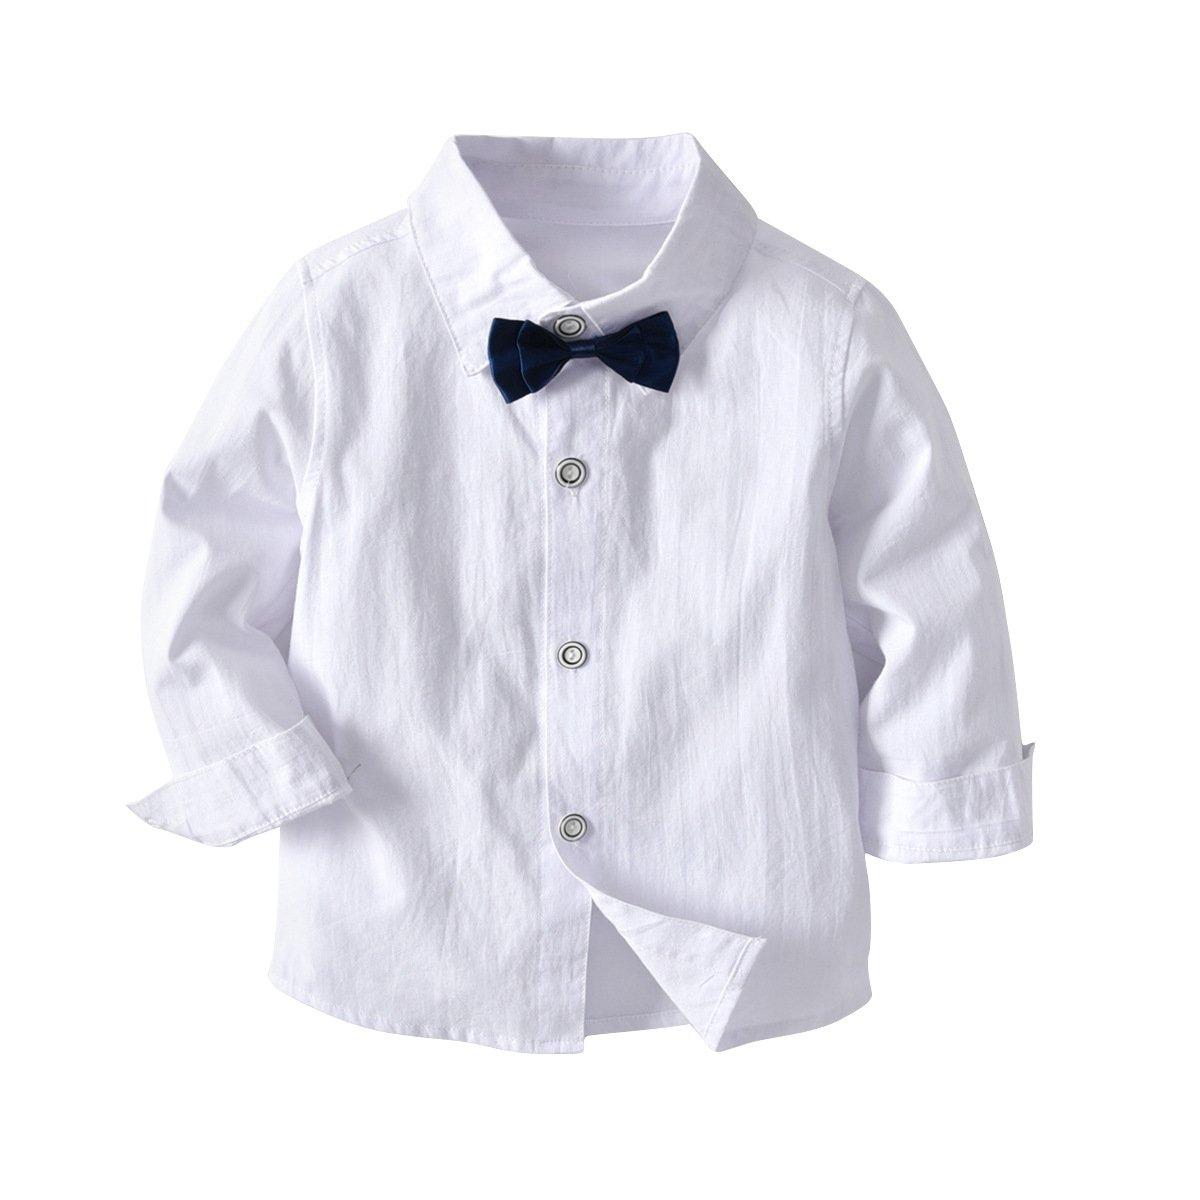 Vest Pants for Kid and Baby Boleyn Boy/'s 3 Pcs Suit Long Sleeve Bowtie Shirts